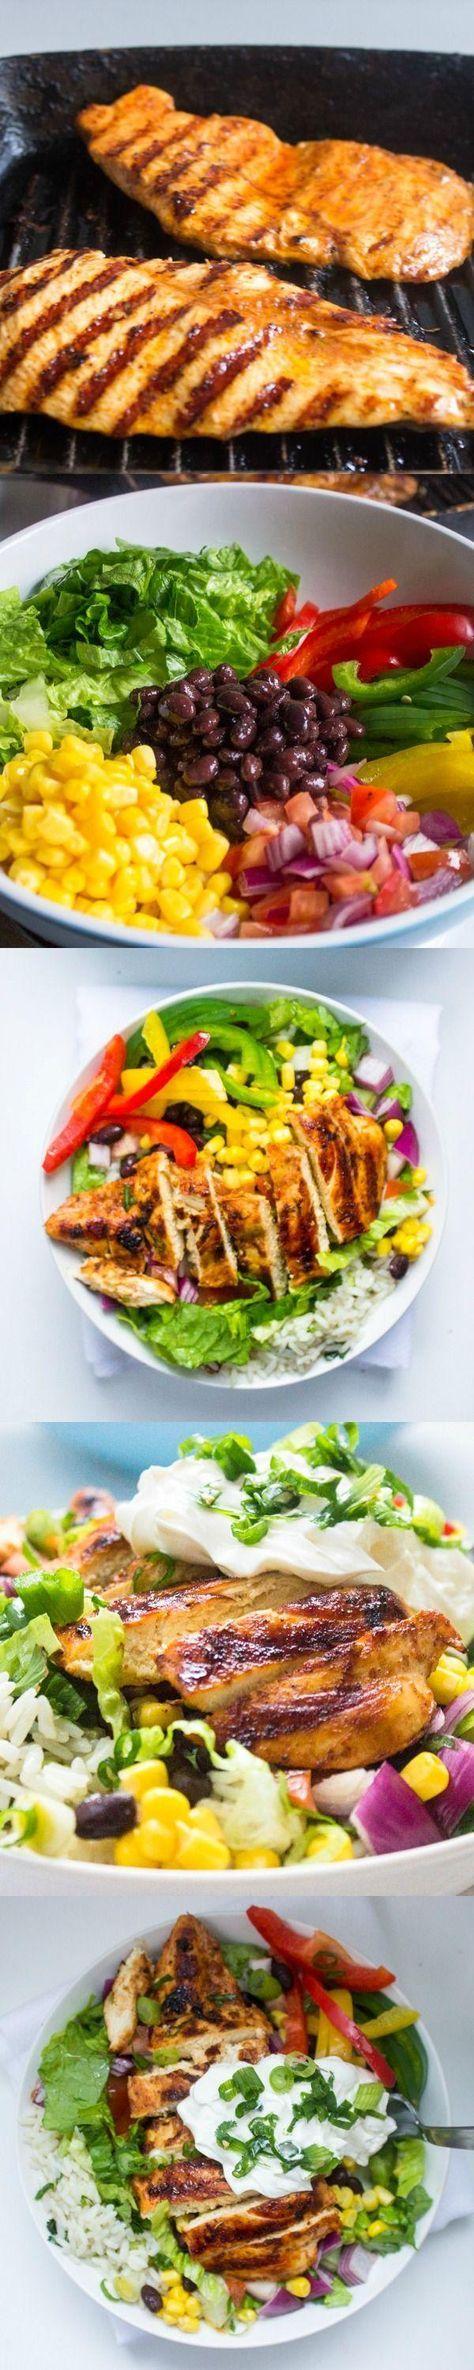 Chipotle chicken salad bowl